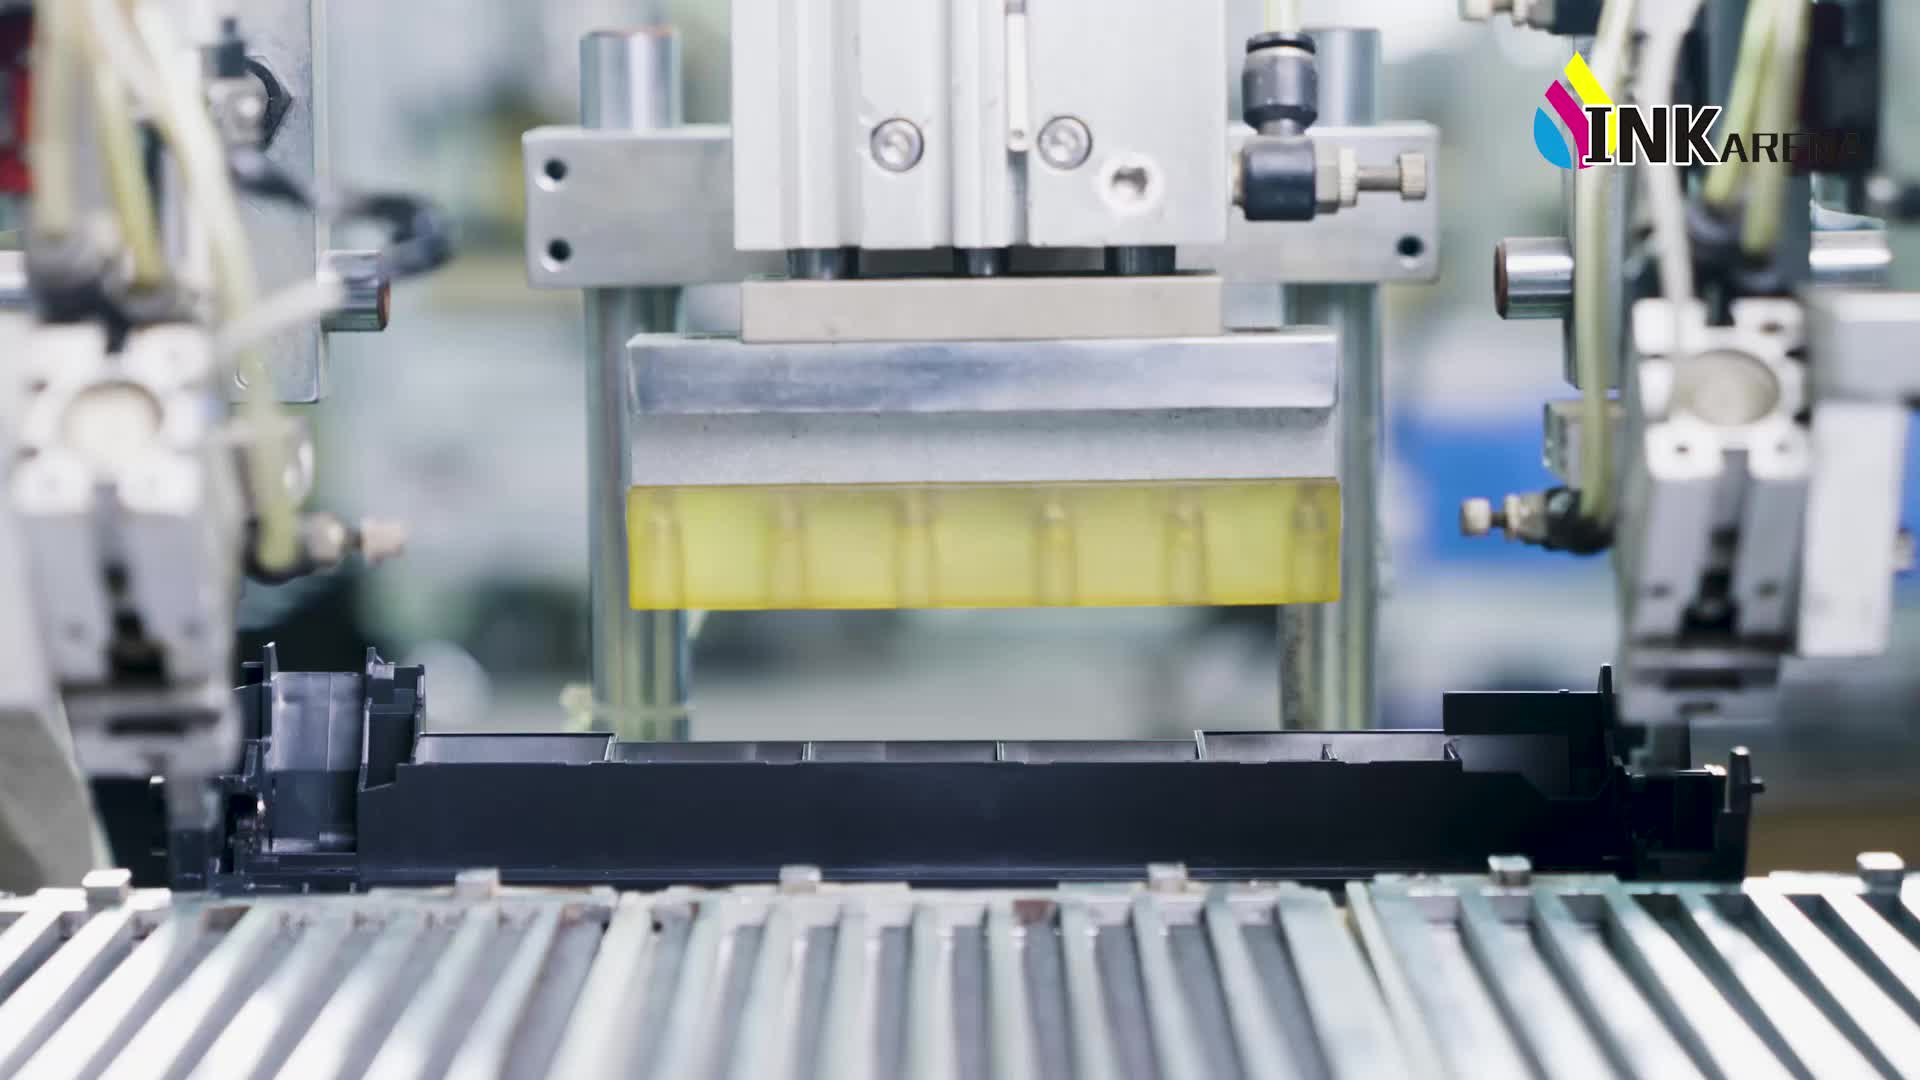 INKARENA سعر الجملة مسحوق حبر متوافق FX10 خرطوشة FX-10 للطابعة كانون FX10